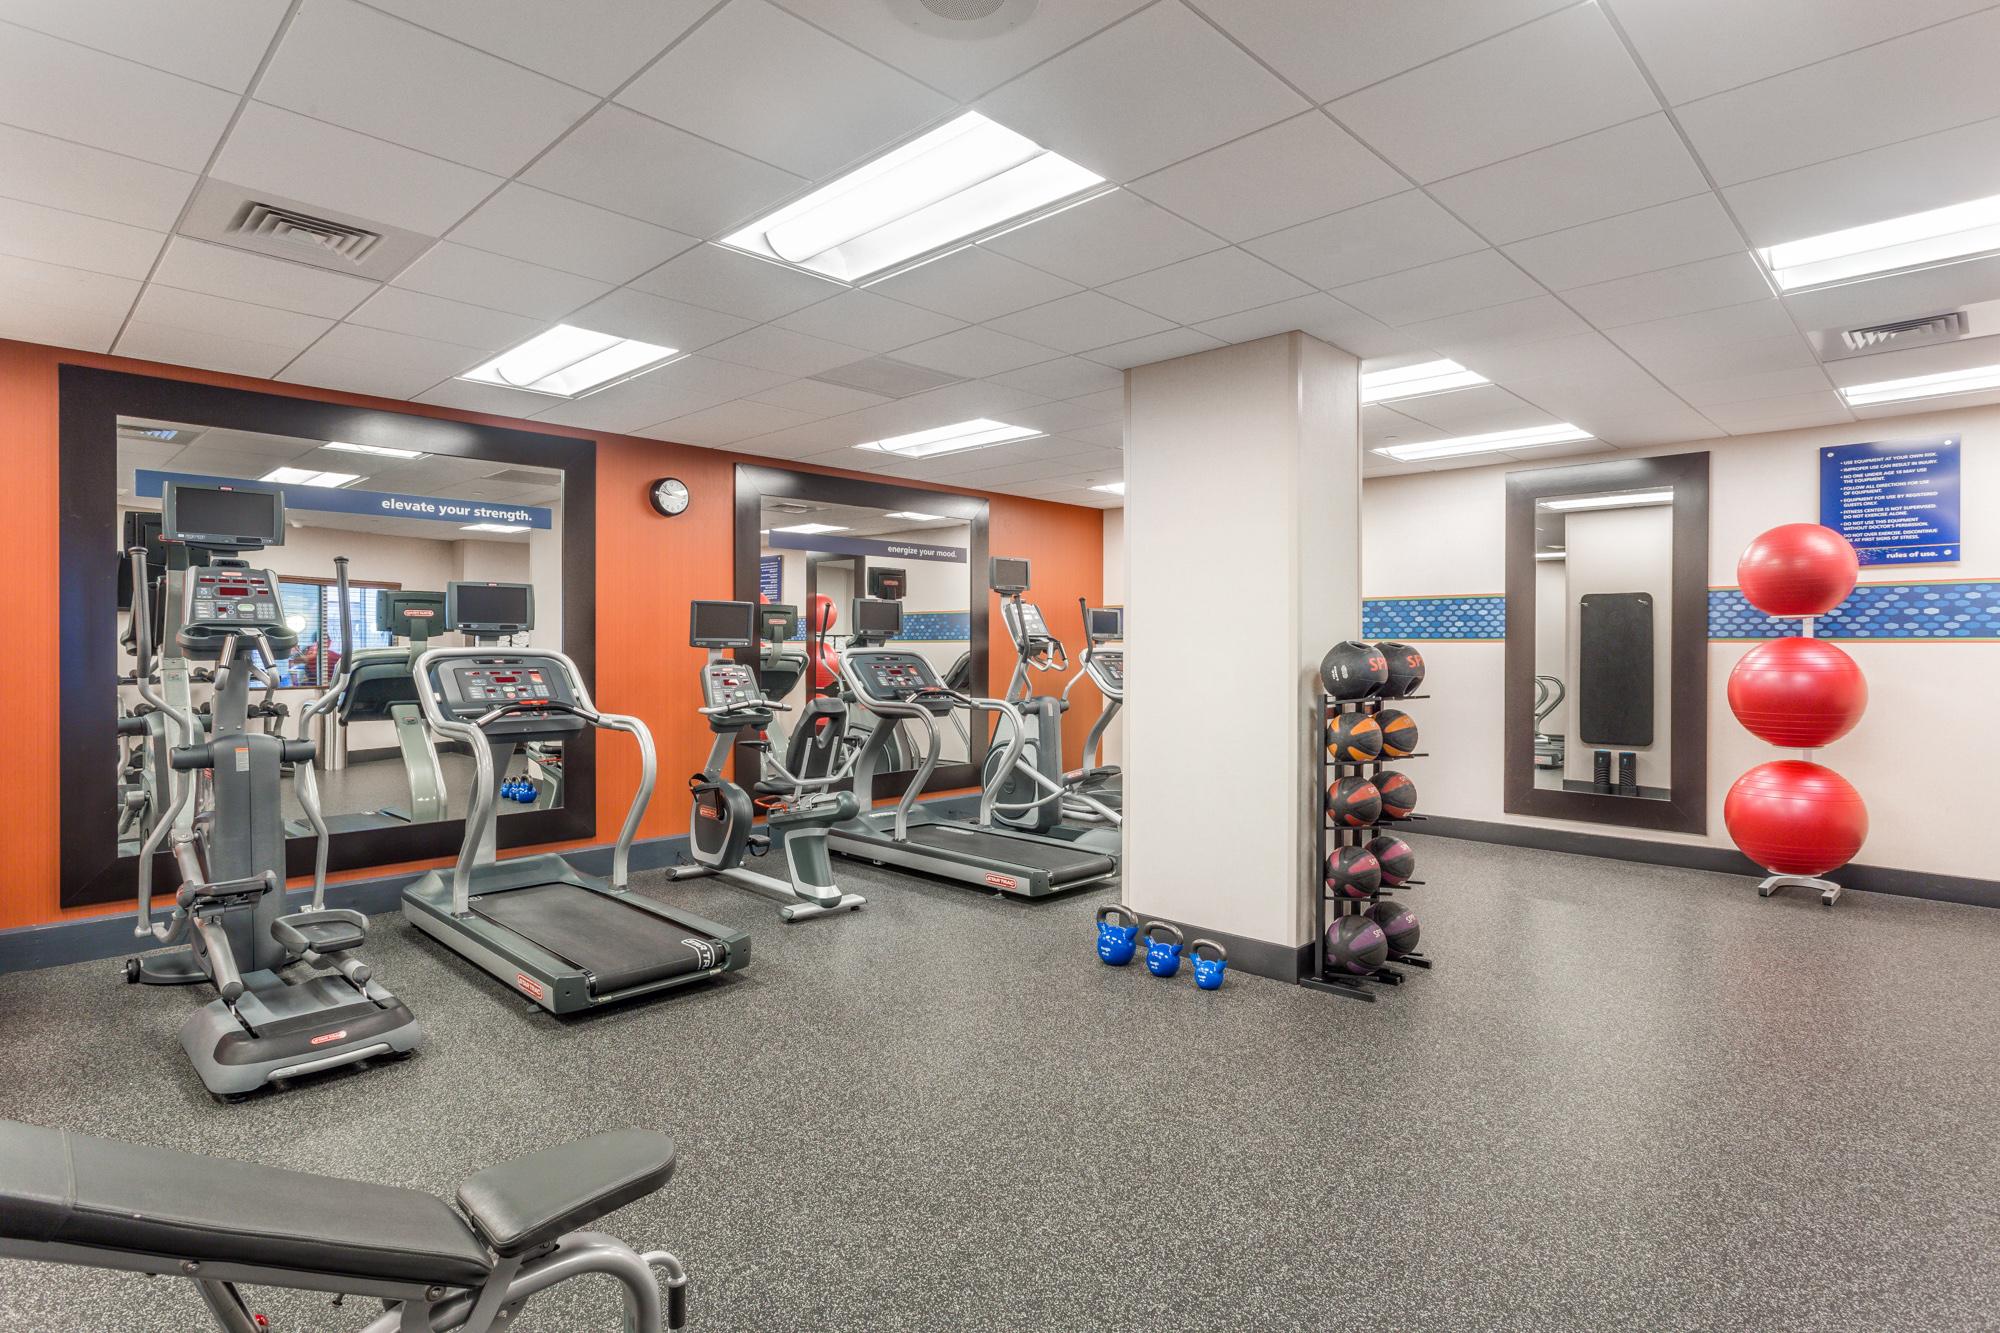 https://www.hotelsbyday.com/_data/default-hotel_image/2/13101/hampton-inn-msnbjhx-downtown-madison-wi-fitness-center-0117-low-res.jpg